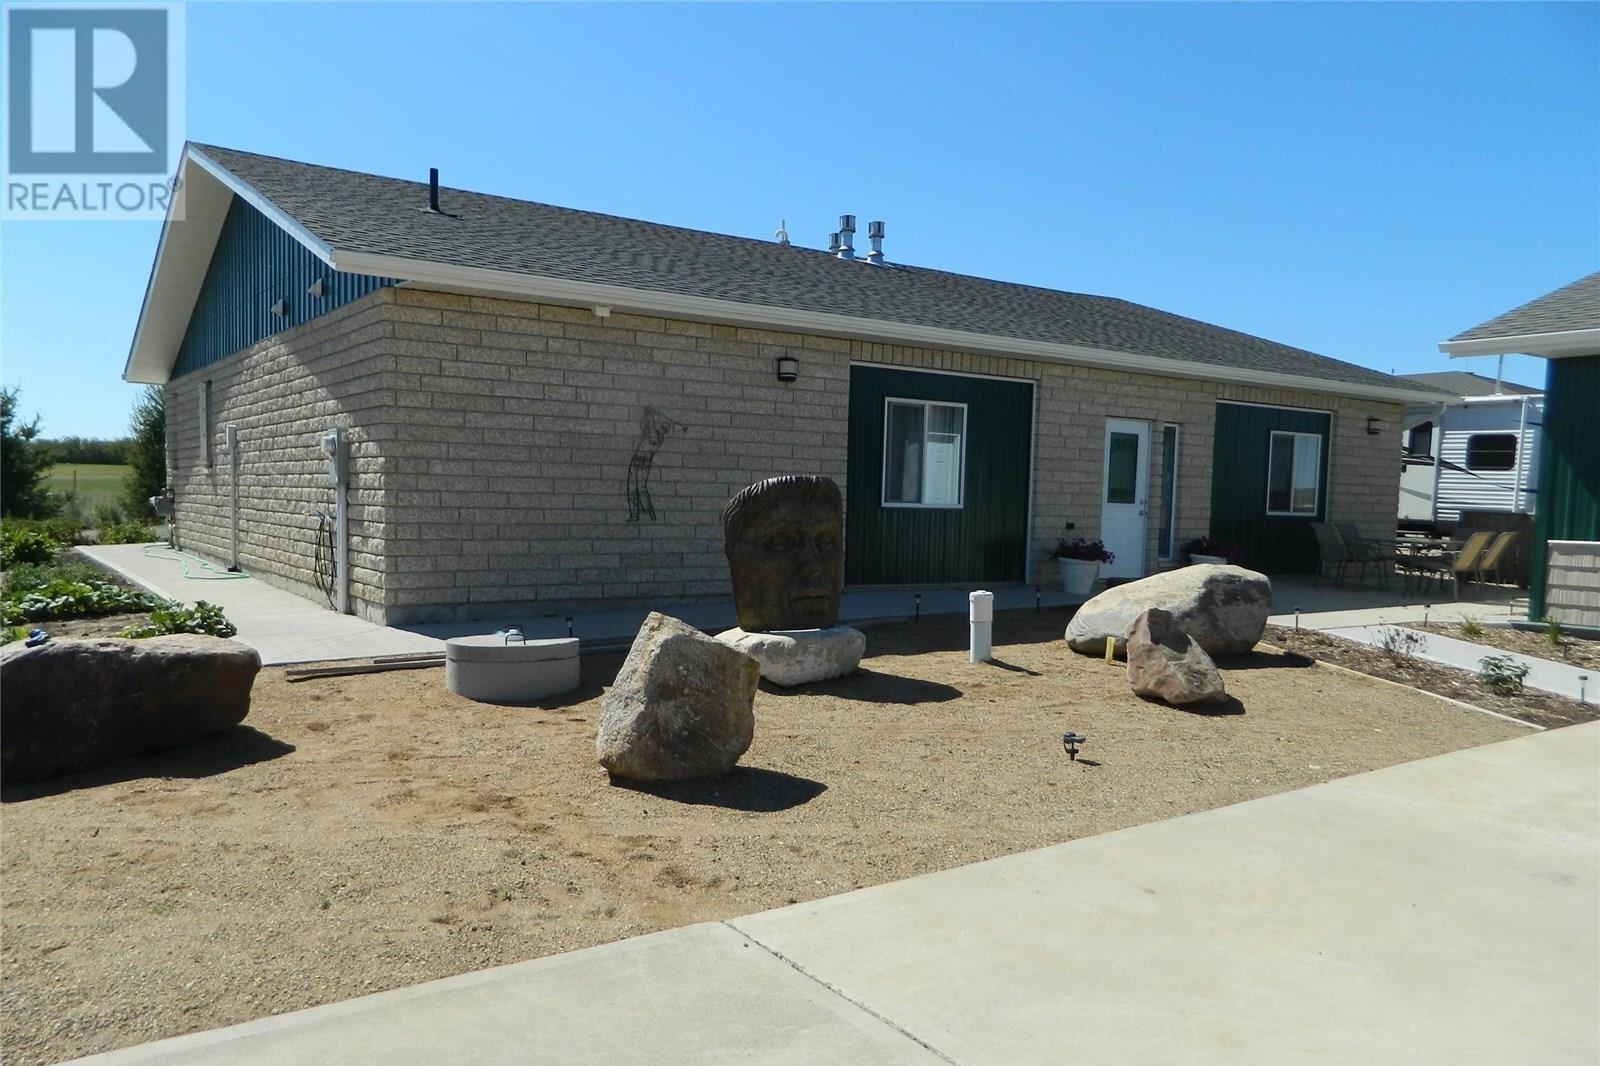 House for sale at 1 Sunrise Blvd Unit LOT Craik Saskatchewan - MLS: SK822141